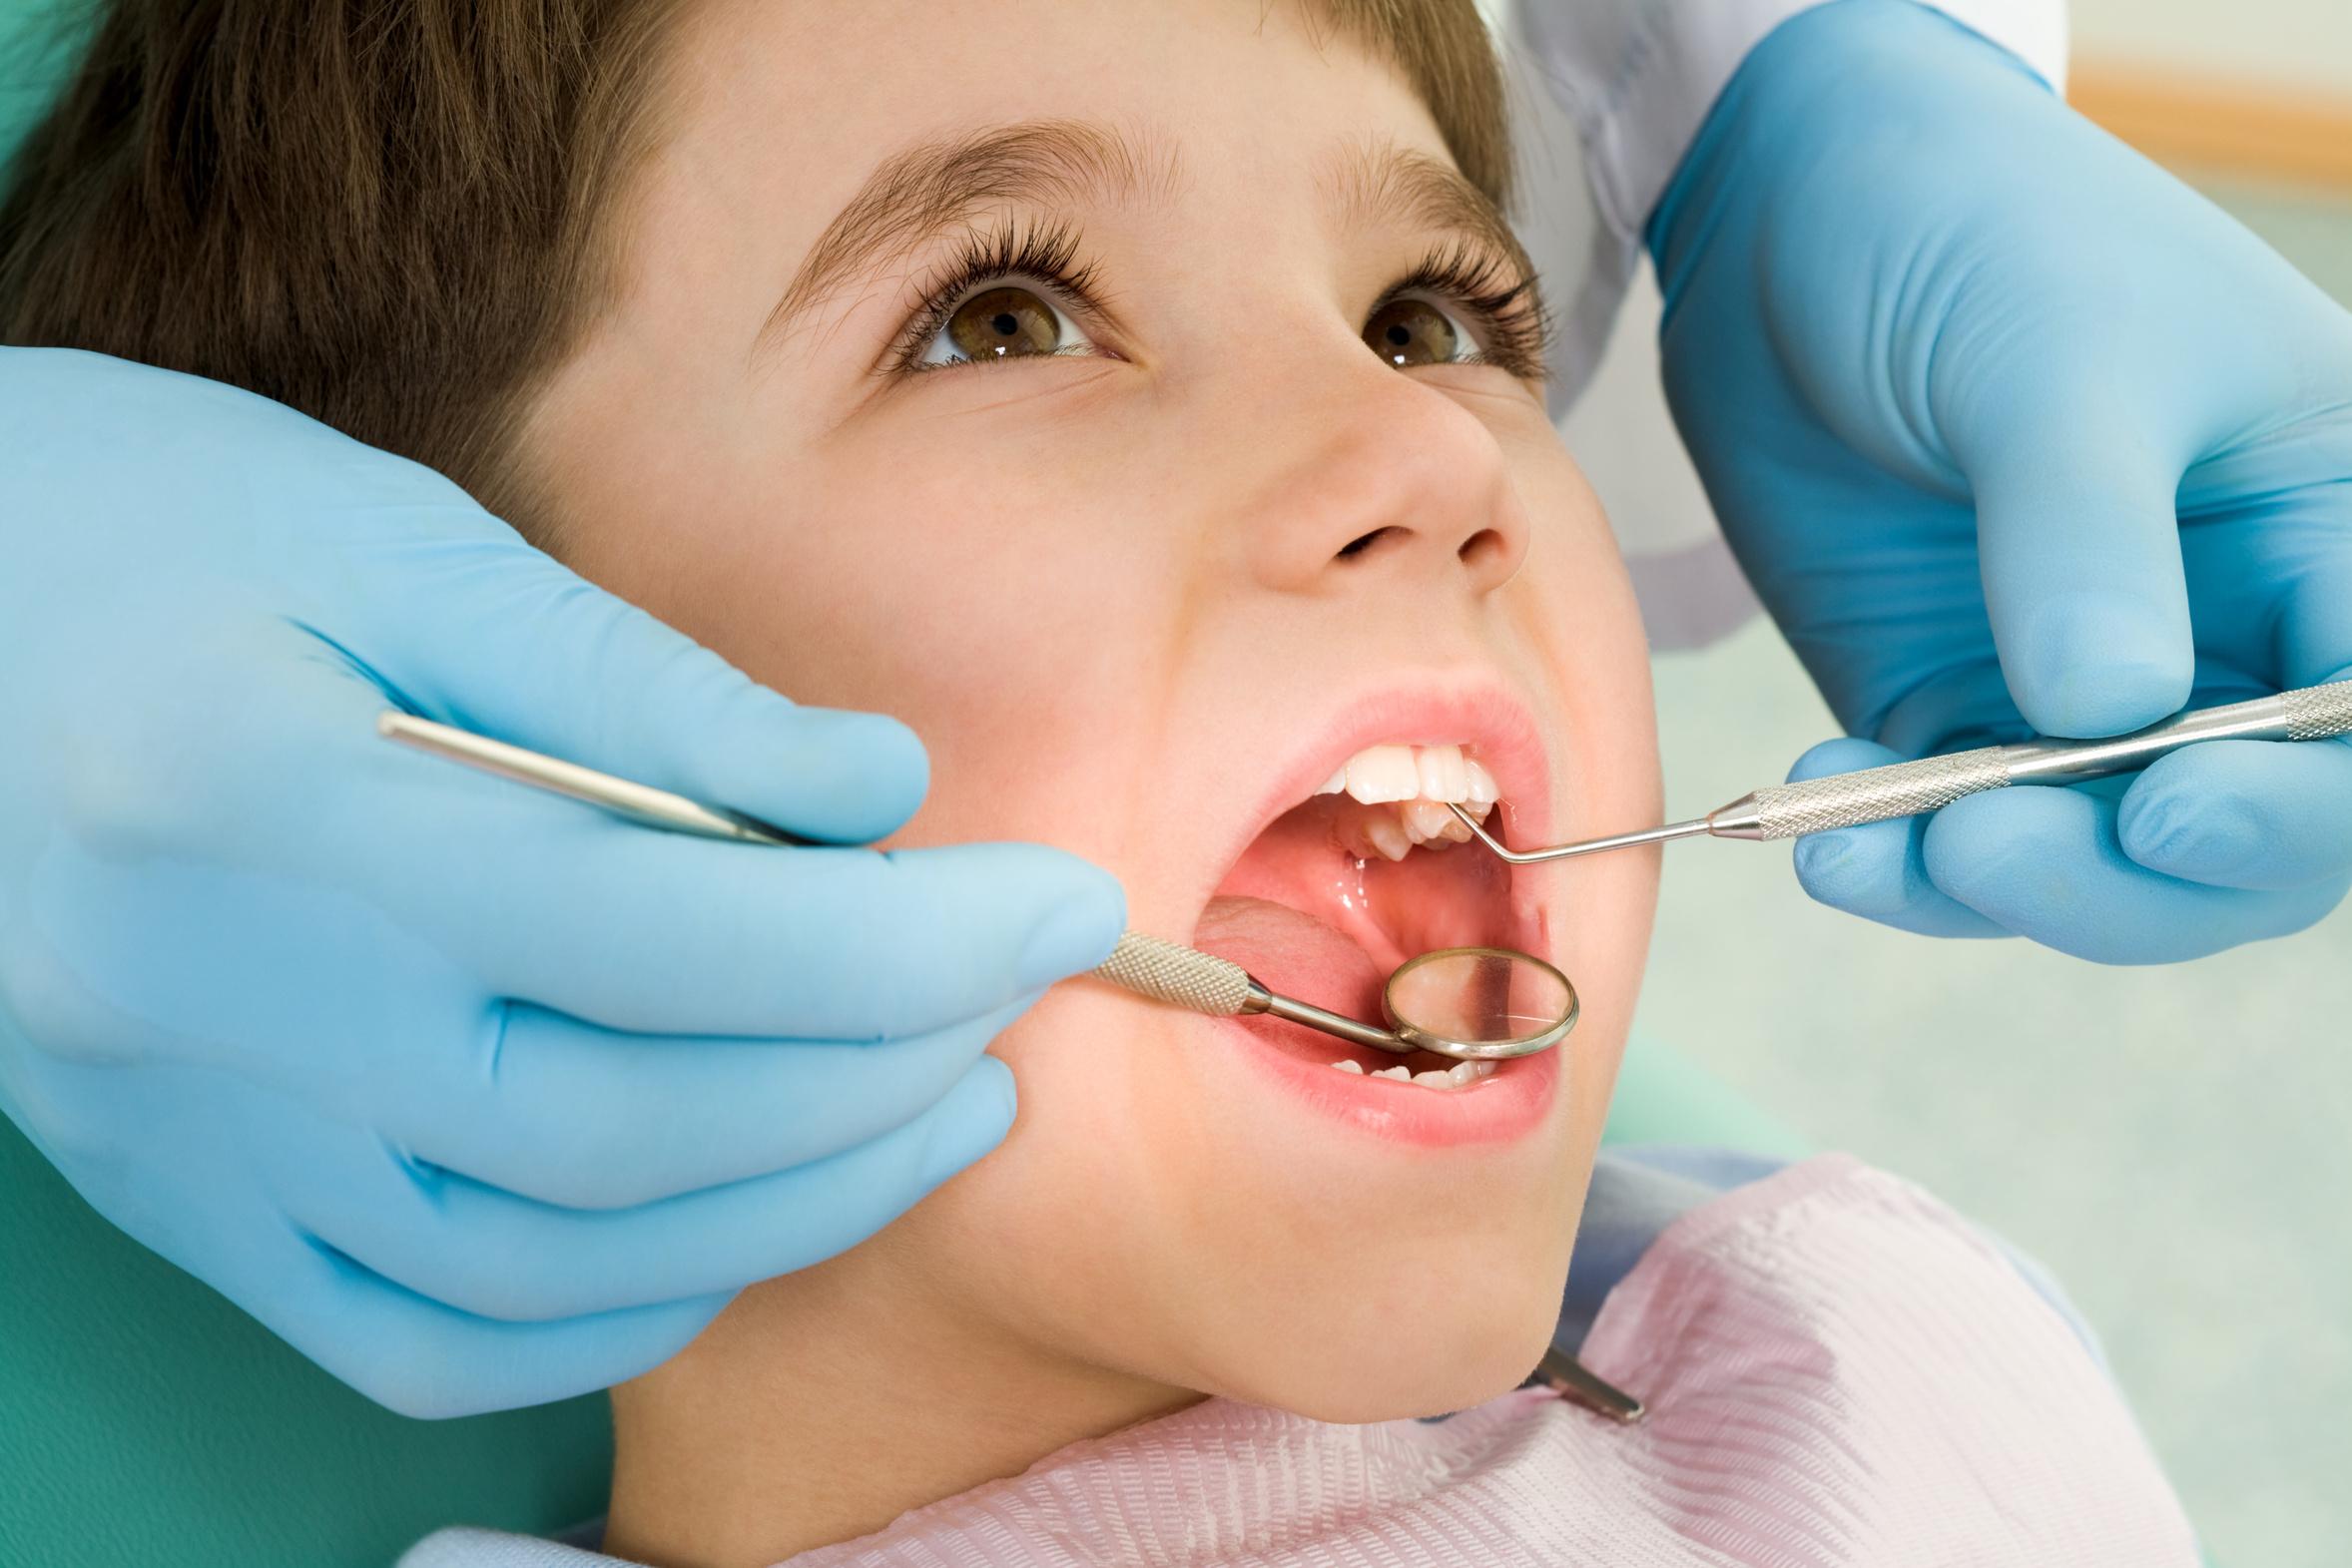 http://clinicadentaldiazfonseca.es/clinicadentaldiazfonseca_files/odontopediatria.jpg